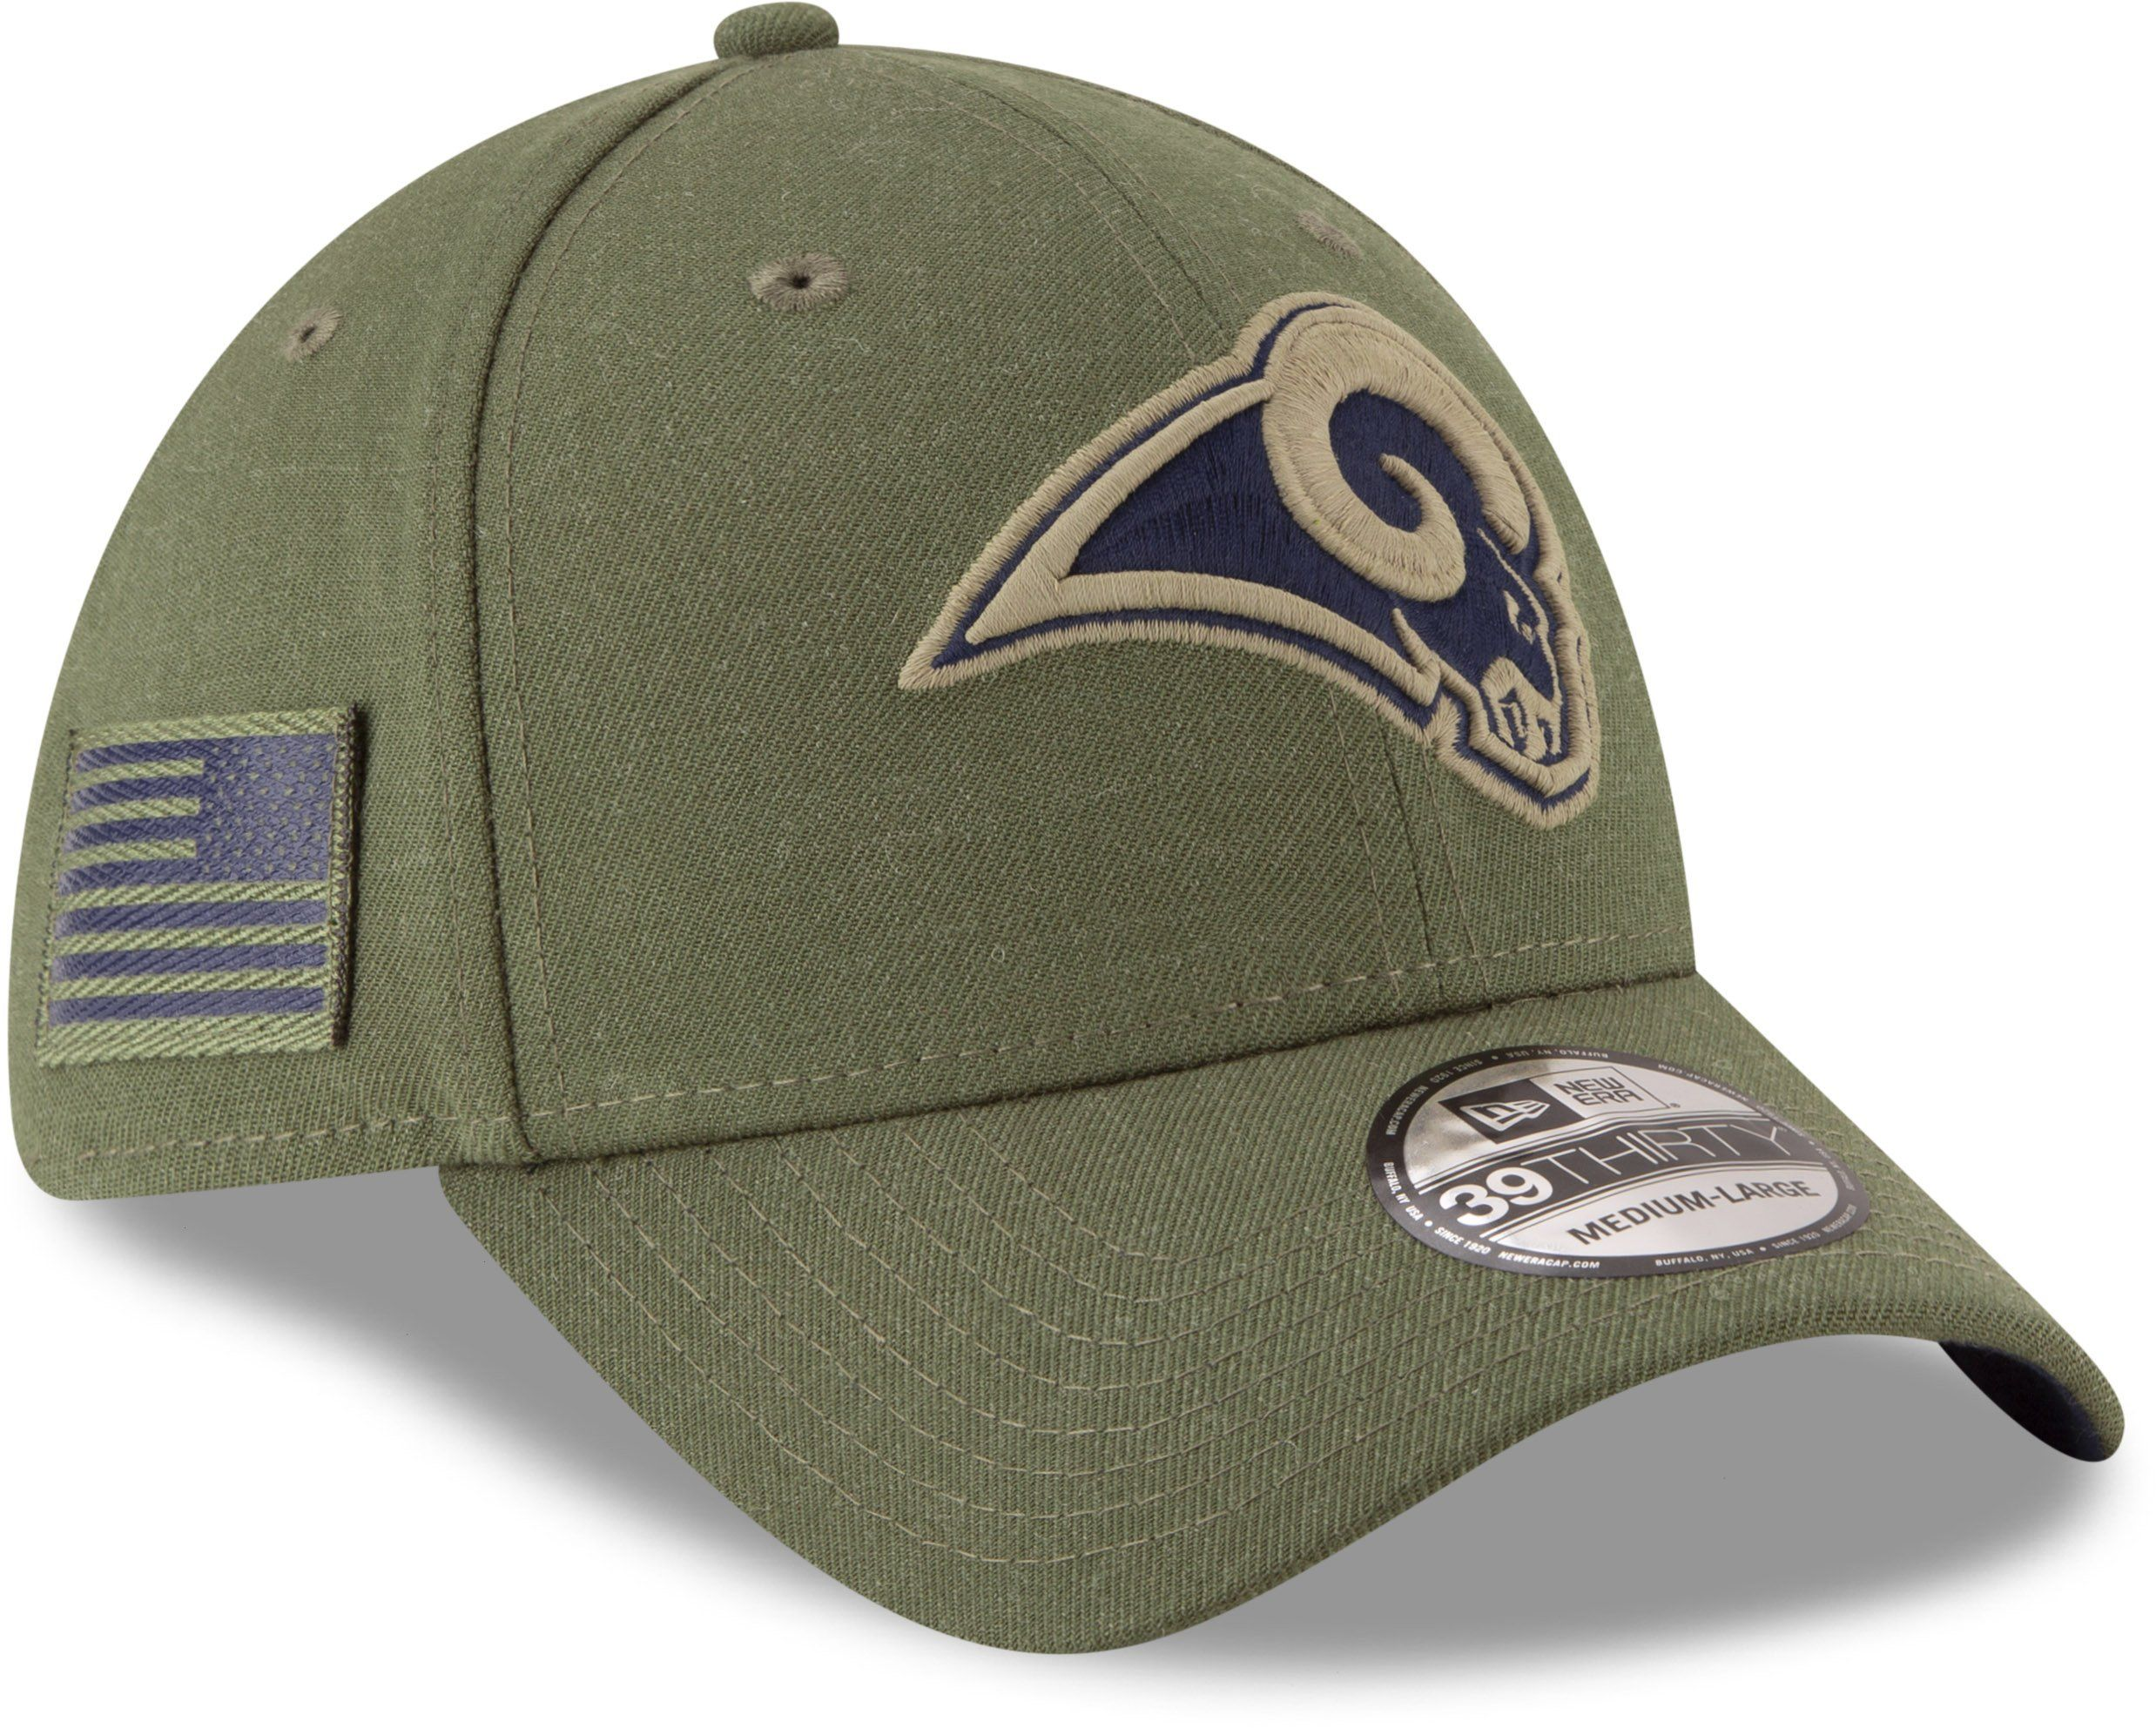 96d061bd3c2 Los Angeles Rams New Era 3930 NFL On Field 2018 STS Stretch Fit Cap –  lovemycap